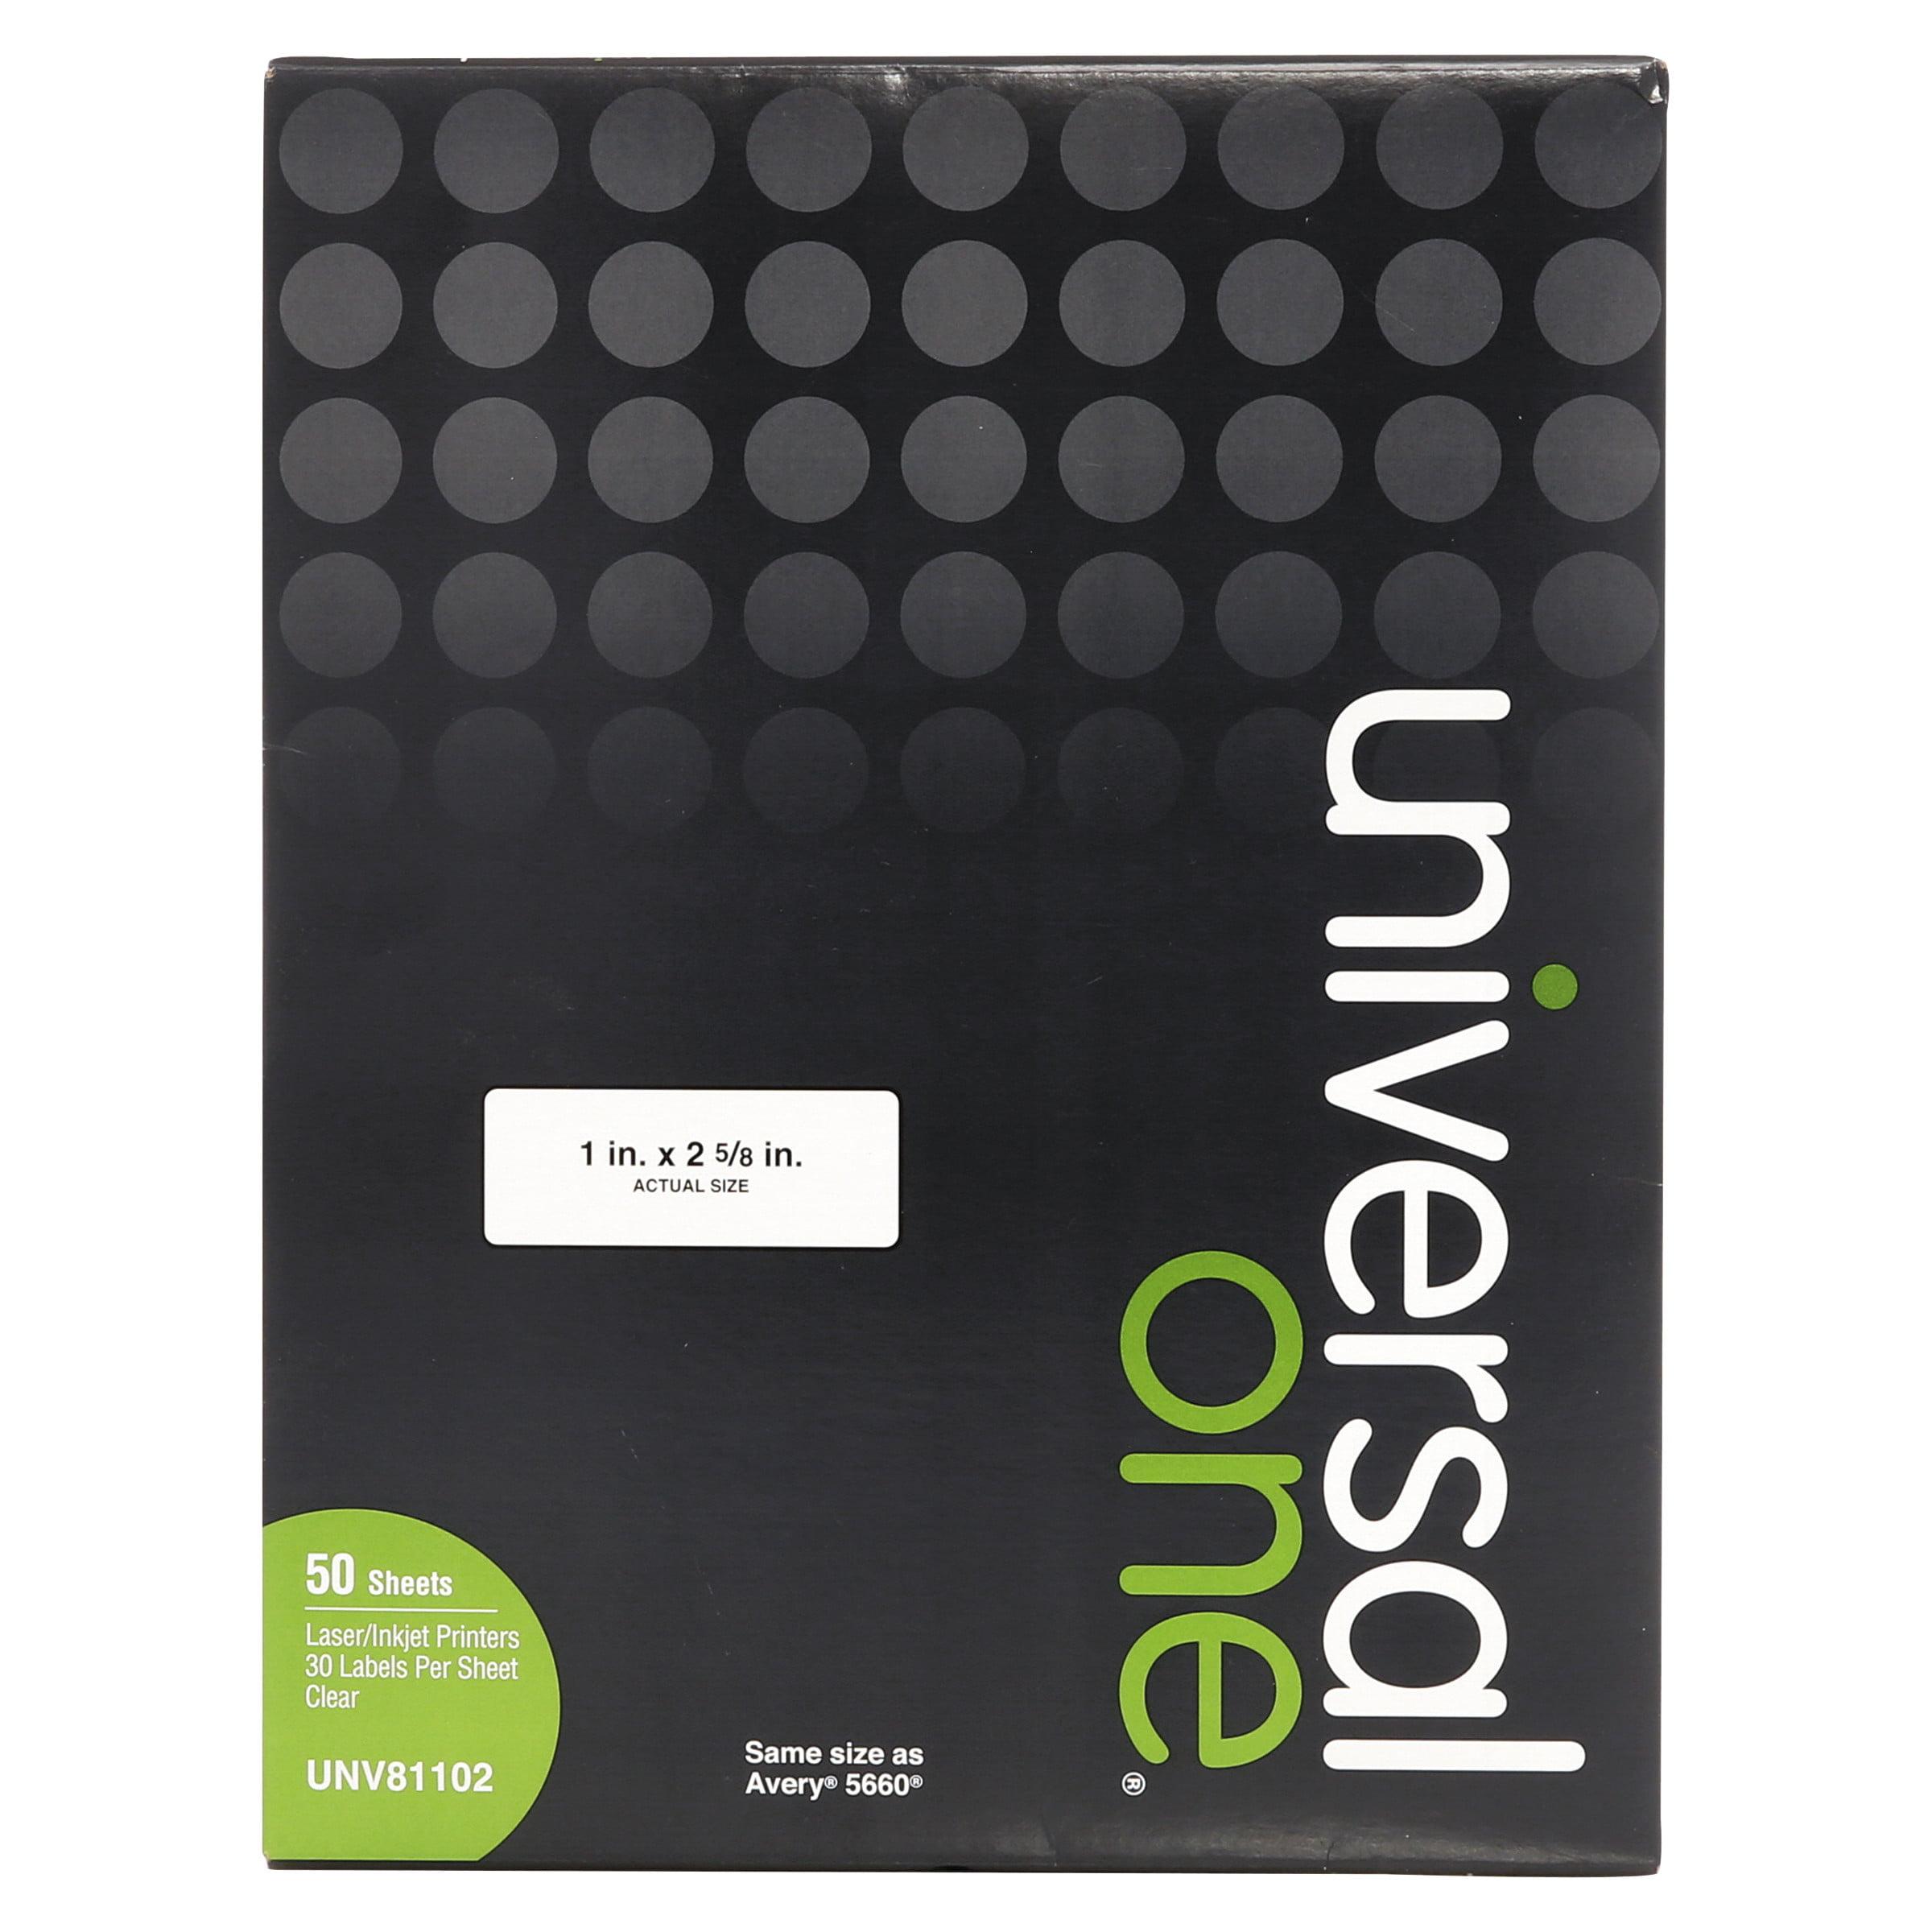 Universal Laser Printer Permanent Labels, 1 x 2-5/8, Clear, 1500/Box -UNV81102